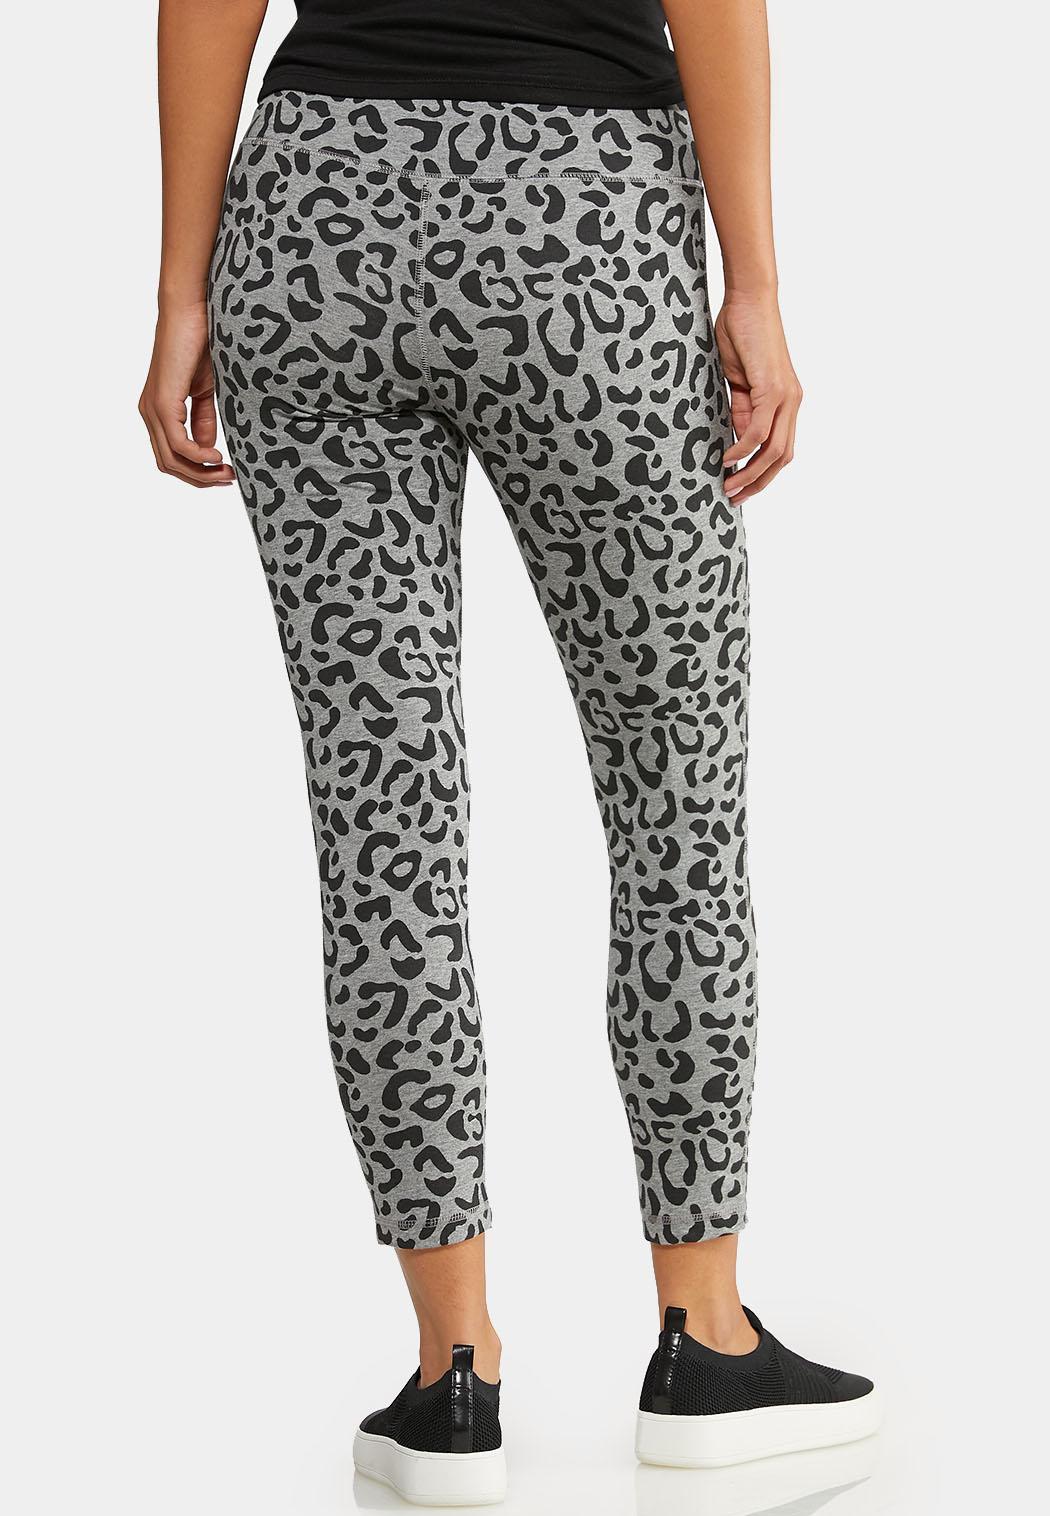 Cropped Leopard Active Leggings (Item #43964407)